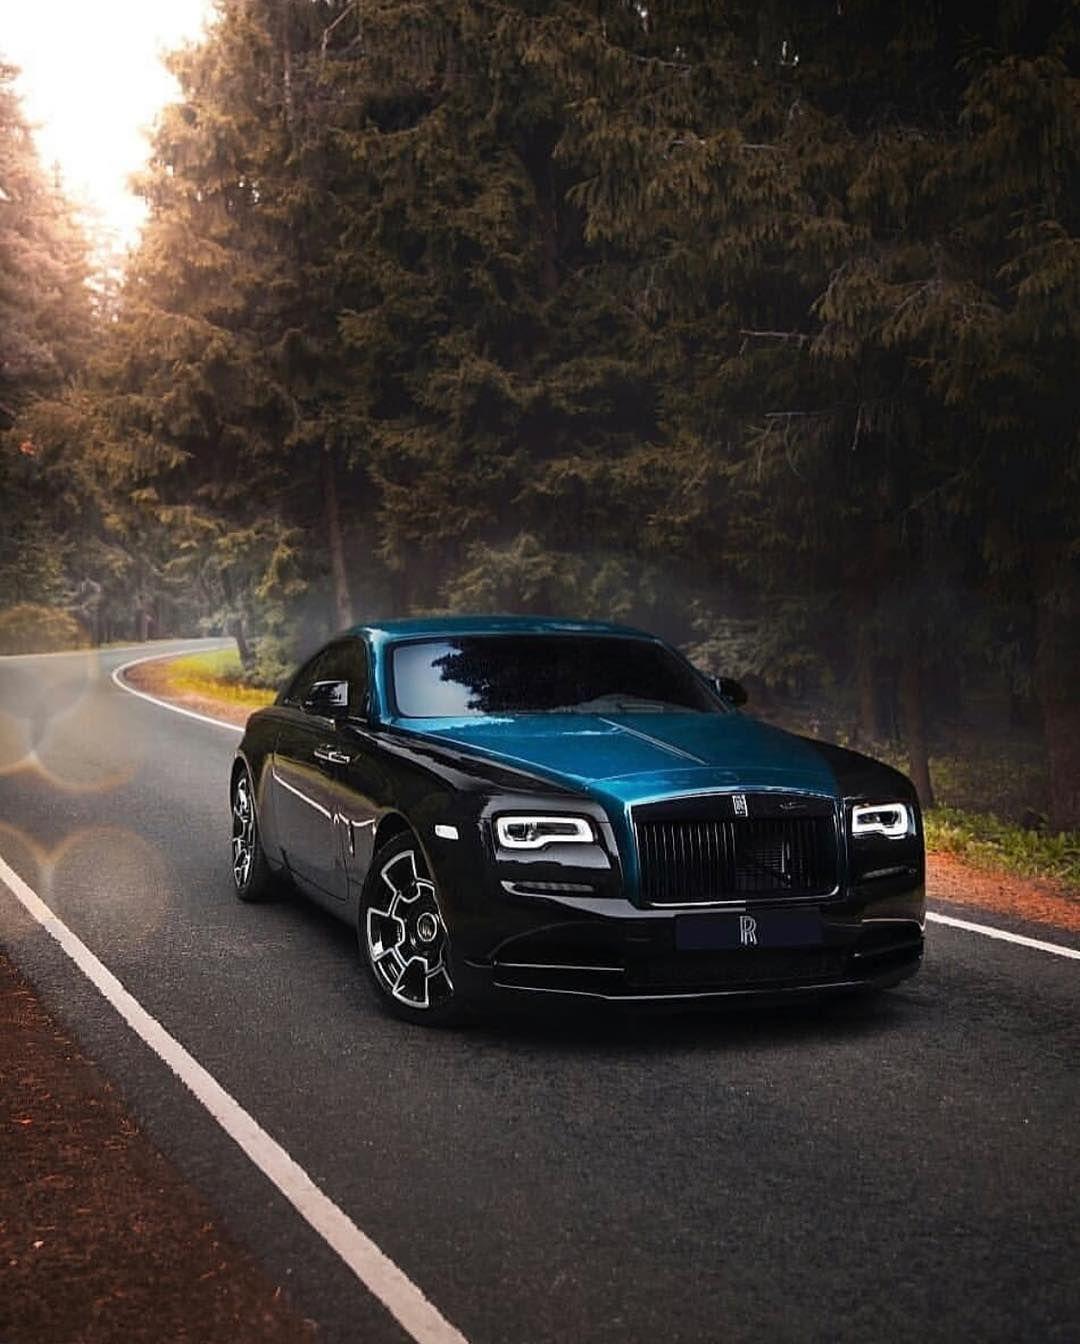 Trending 10 Beegcom Best Interior Design School Seattle Luxury Cars Rolls Royce Rolls Royce Dawn Rolls Royce Cars